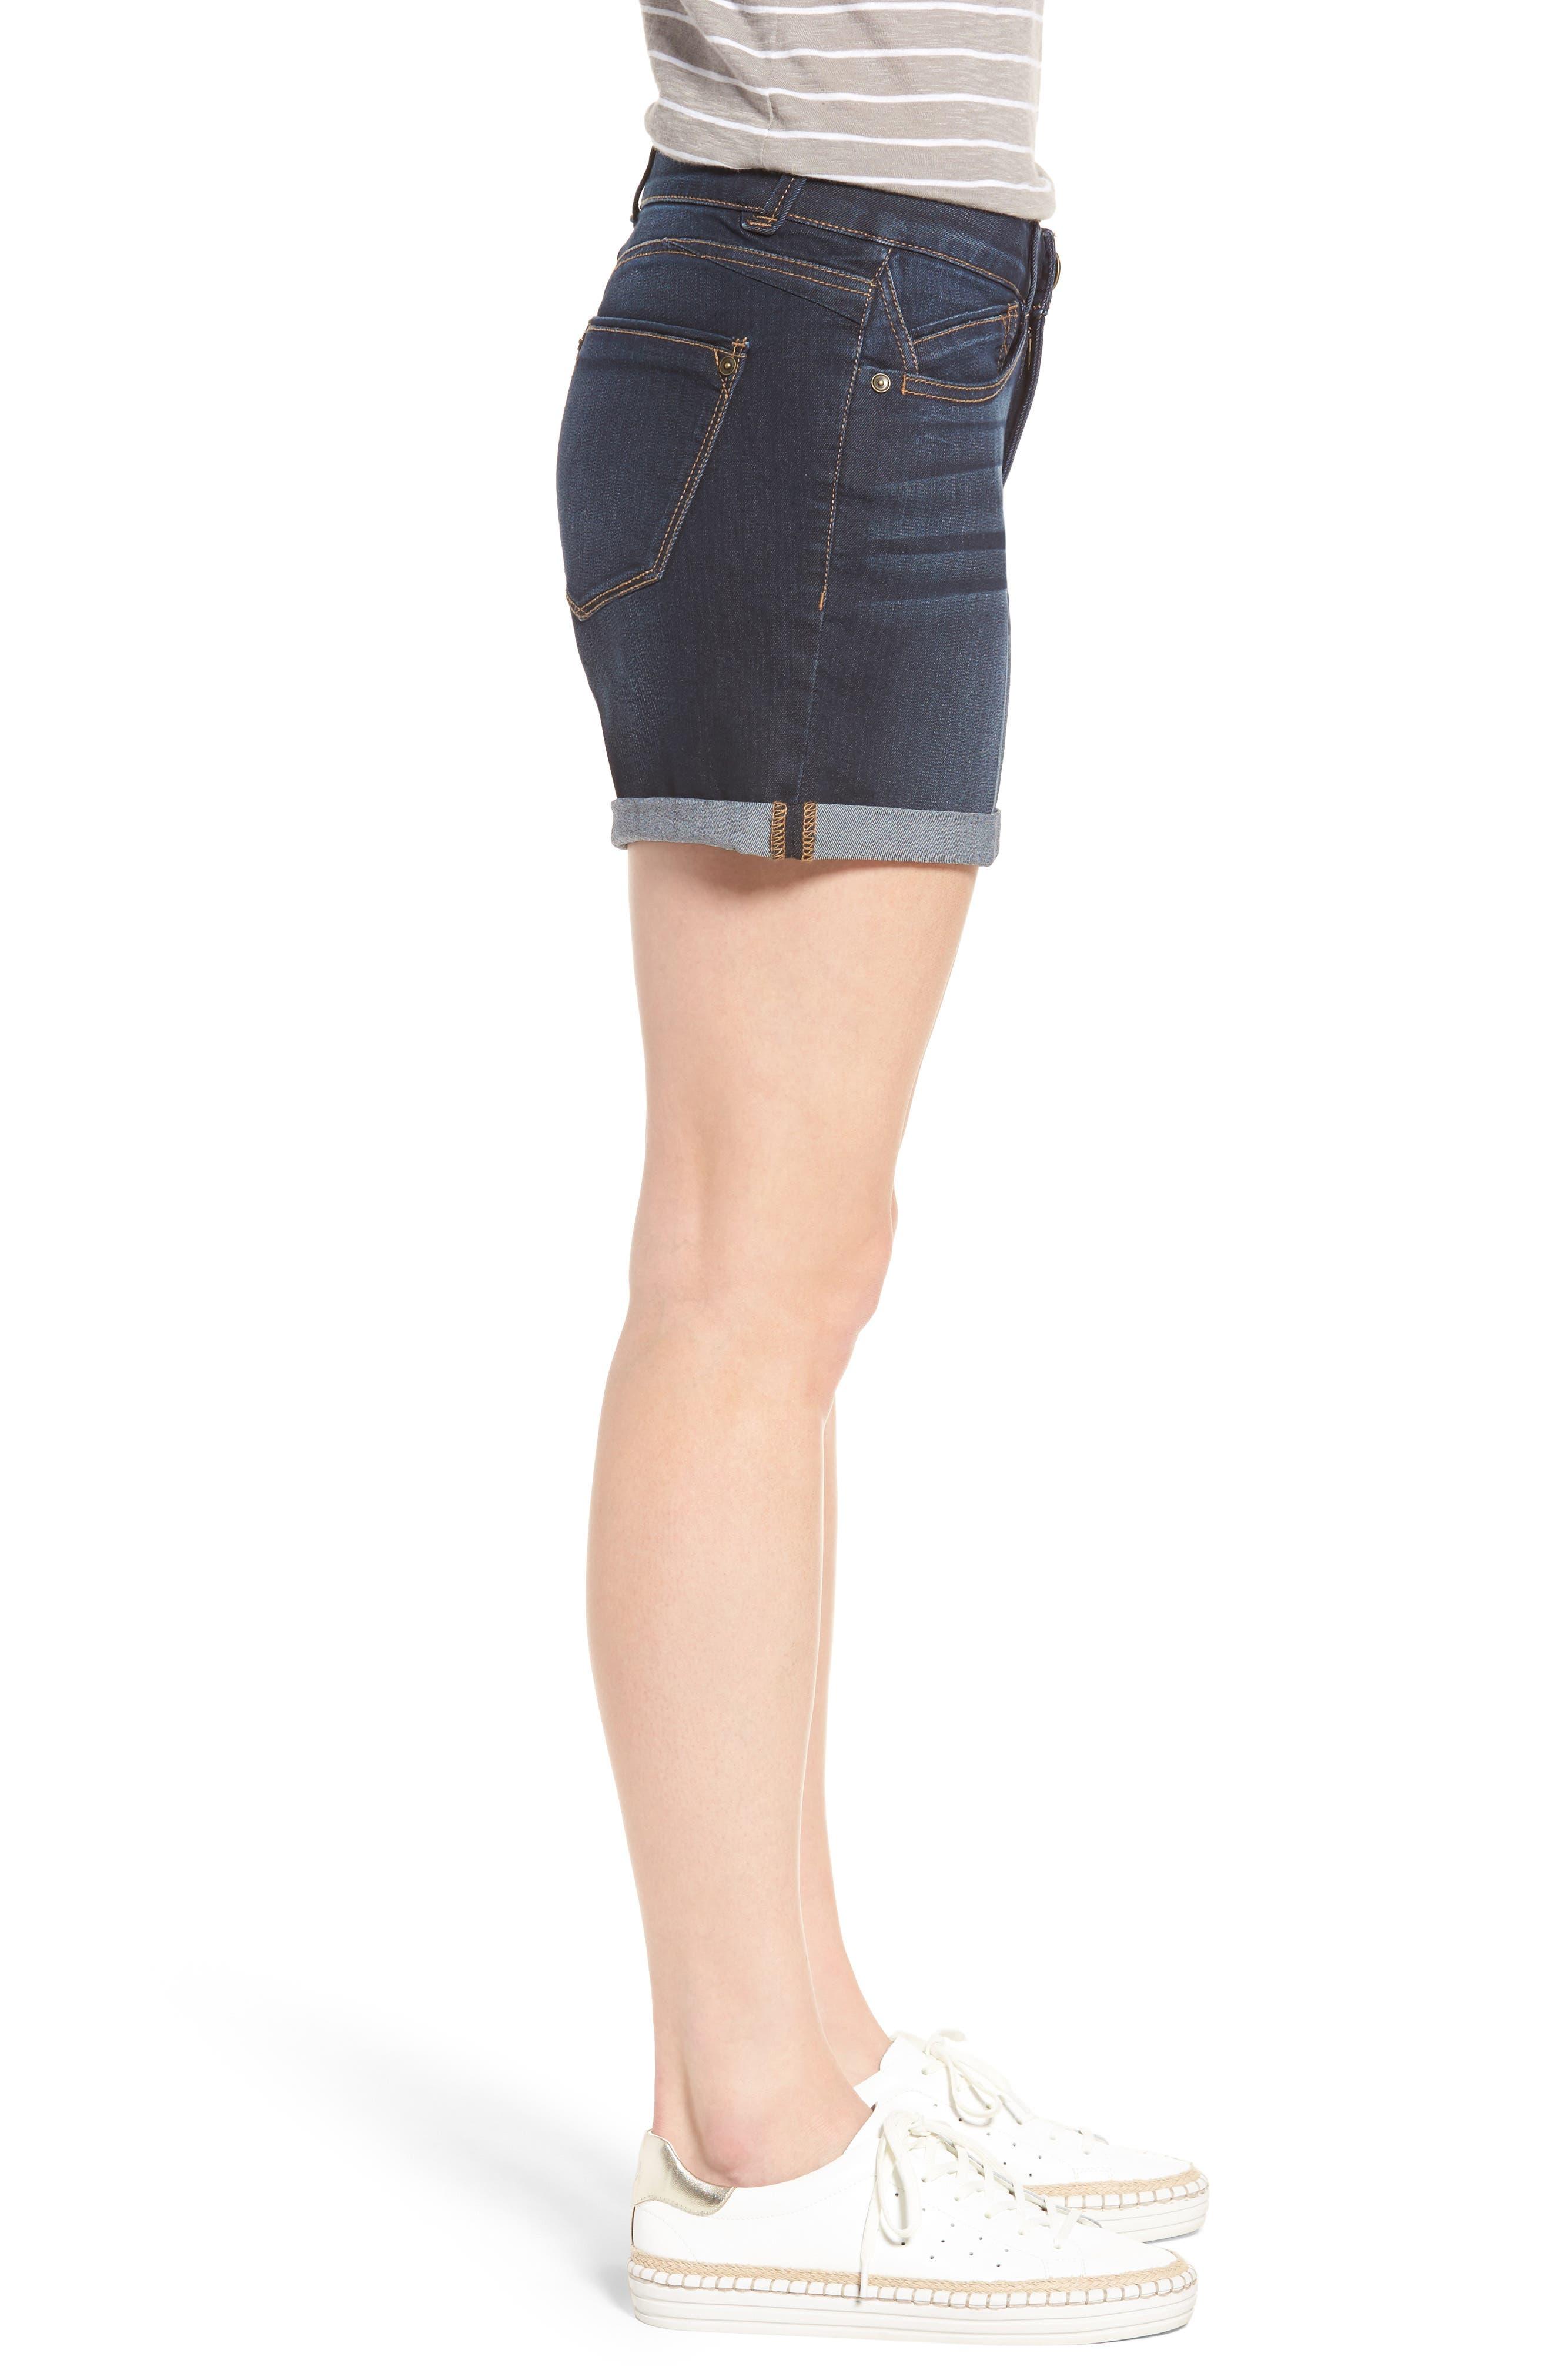 Ab-solution Cuffed Denim Shorts,                             Alternate thumbnail 3, color,                             402